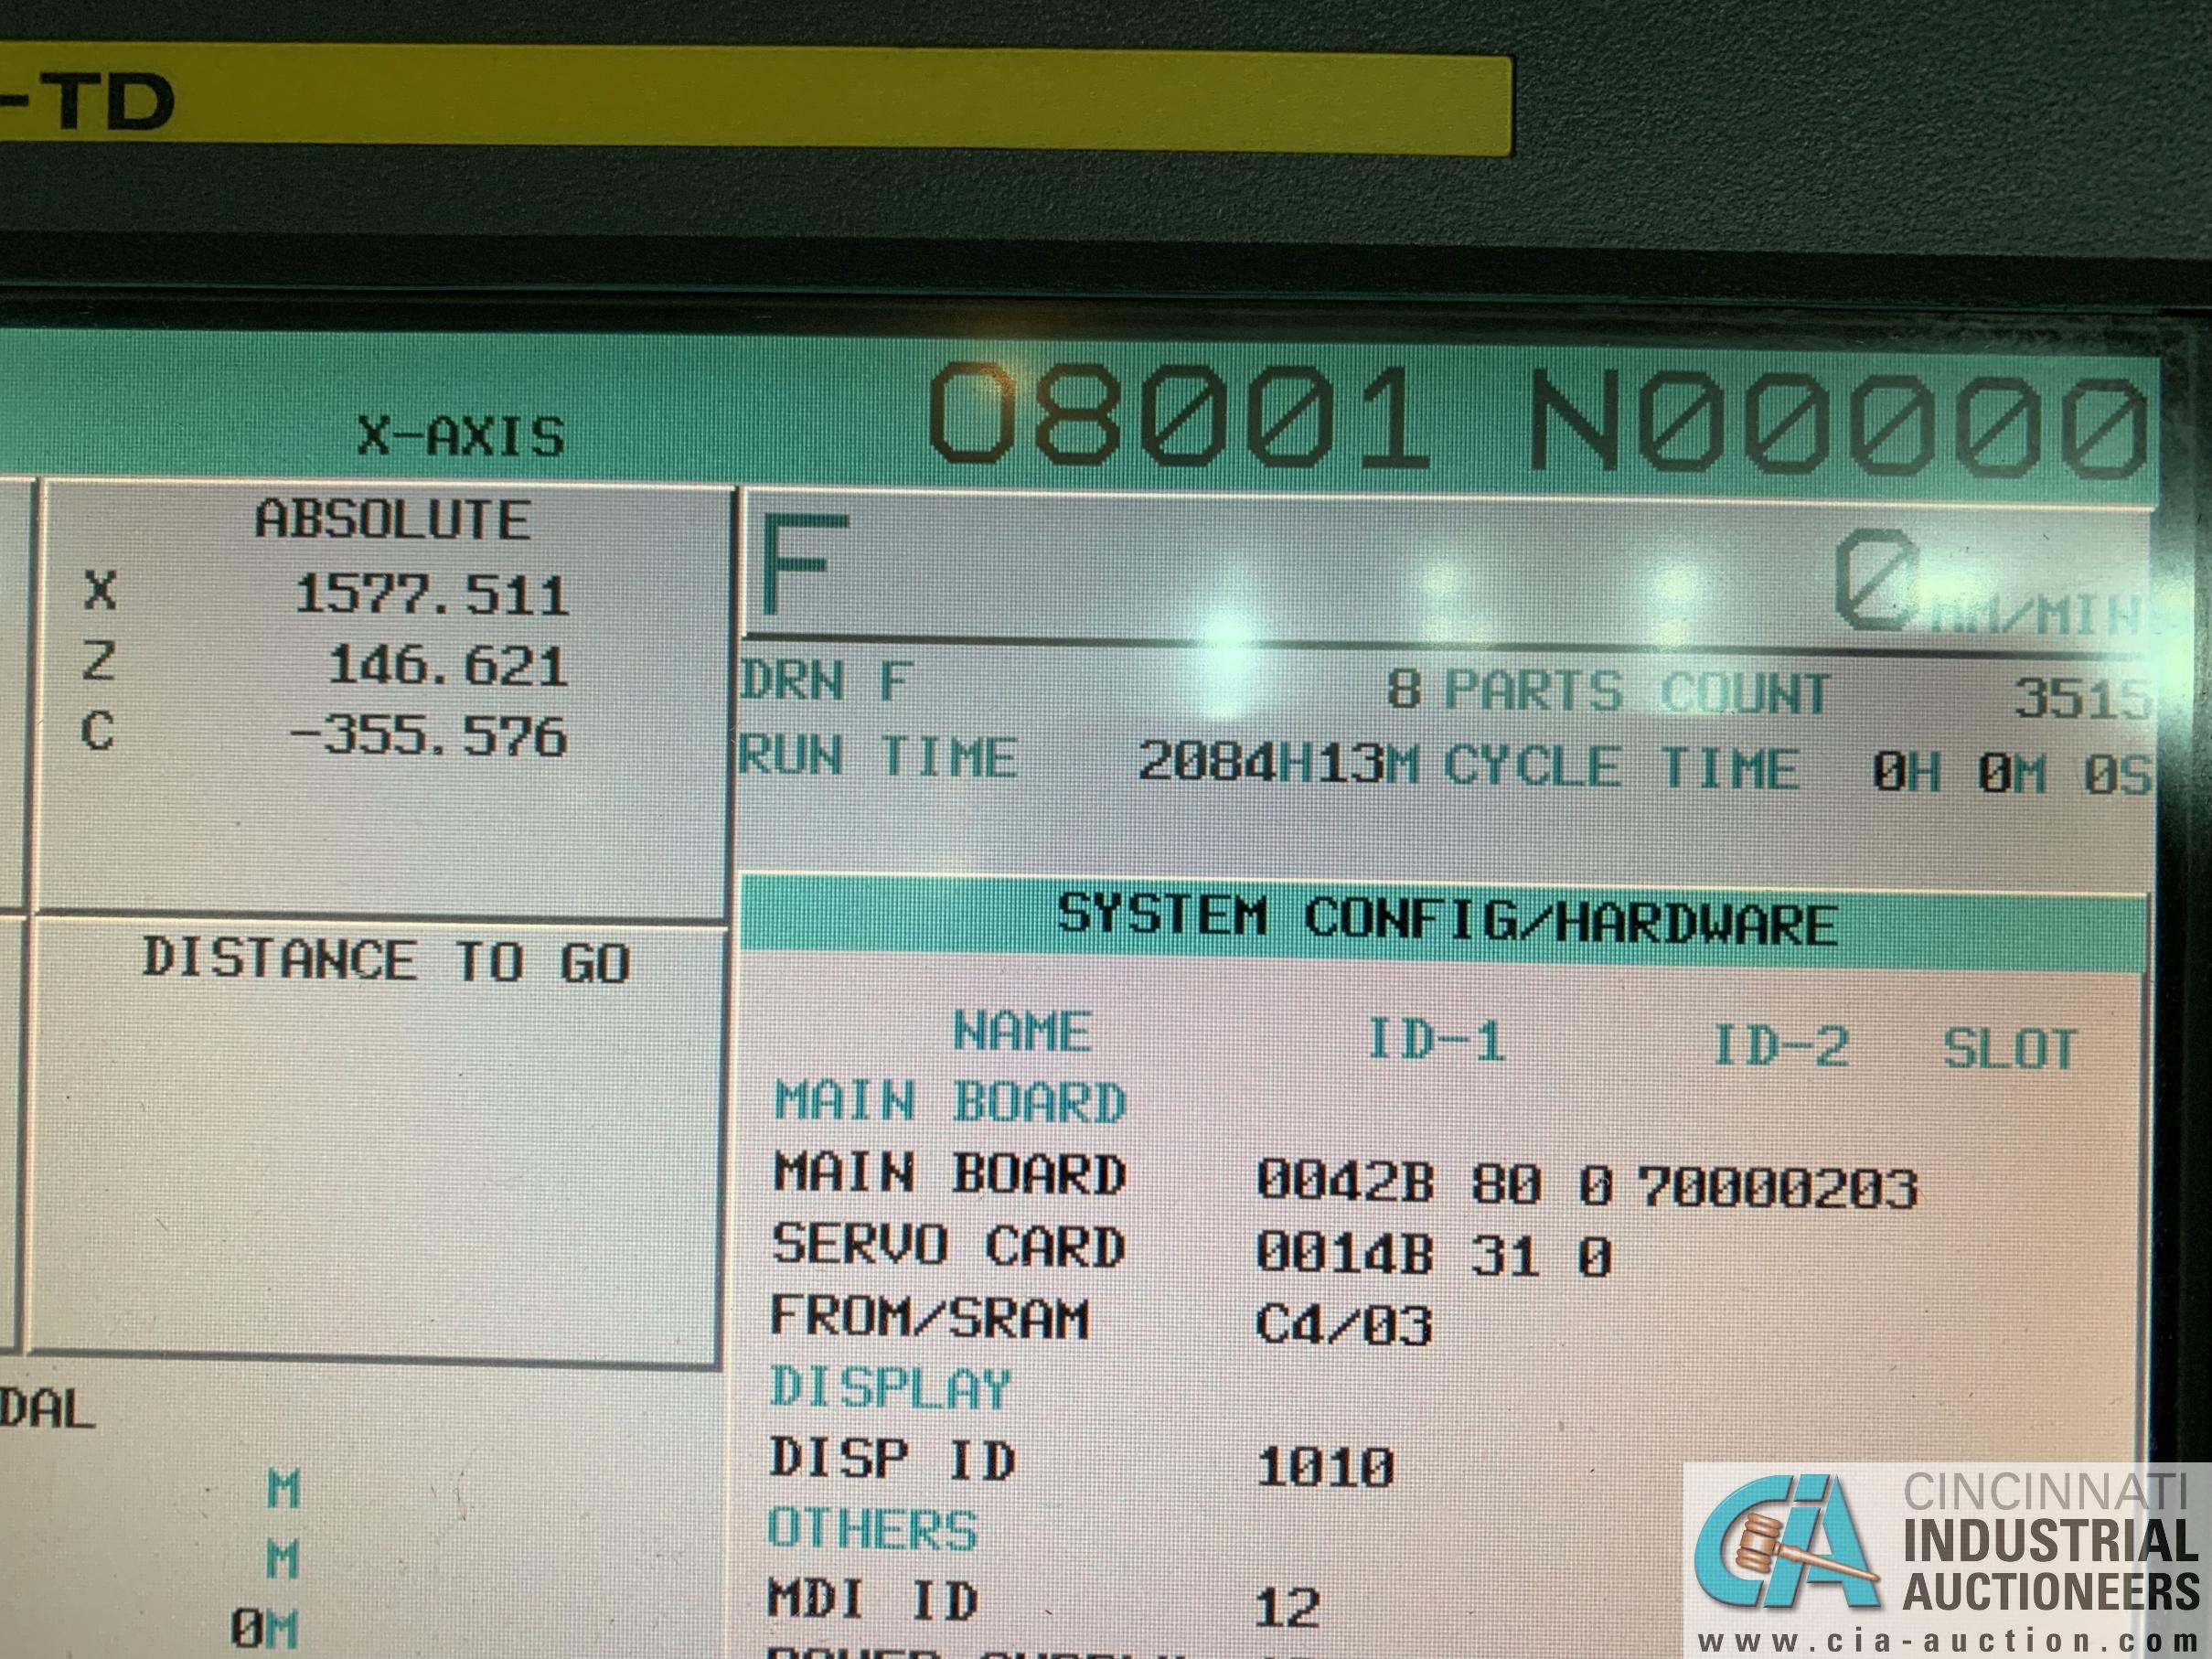 "49"" / 63"" YOU JI MODEL YV-1200ATC+C CNC VERTICAL BORING MILL W/20 HP LIVE TOOLING; - Image 7 of 25"